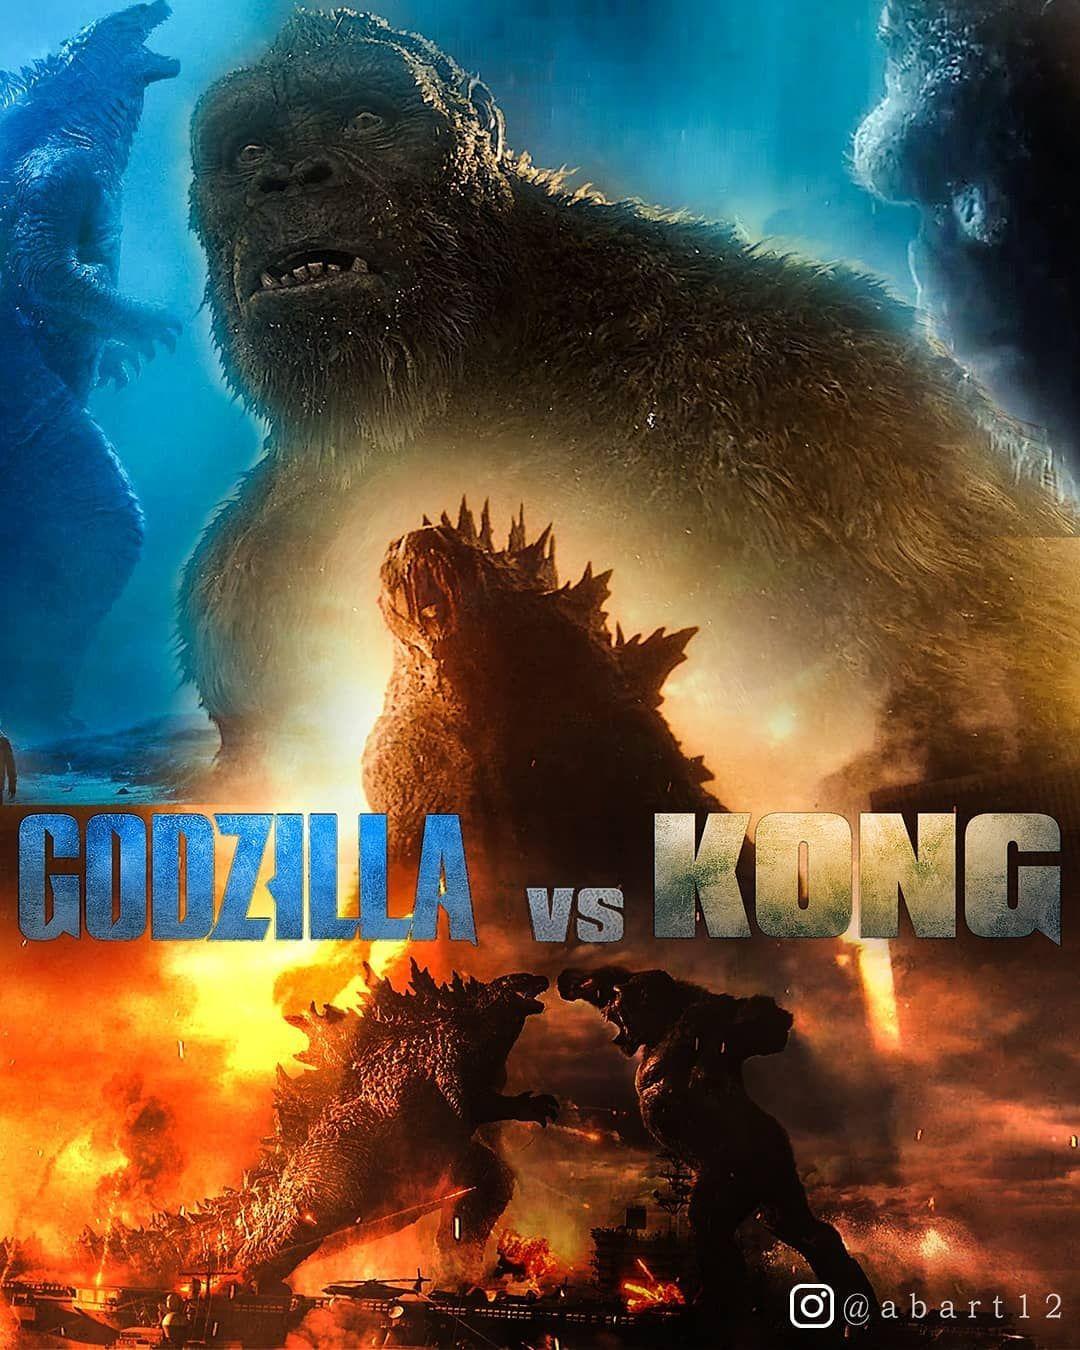 Promiseniloy On Instagram Godzilla Vs Kong Made A Quick Poster Of Godzilla Vs Kong Movie What You Guyz Think In 2021 Godzilla Vs All Godzilla Monsters Godzilla